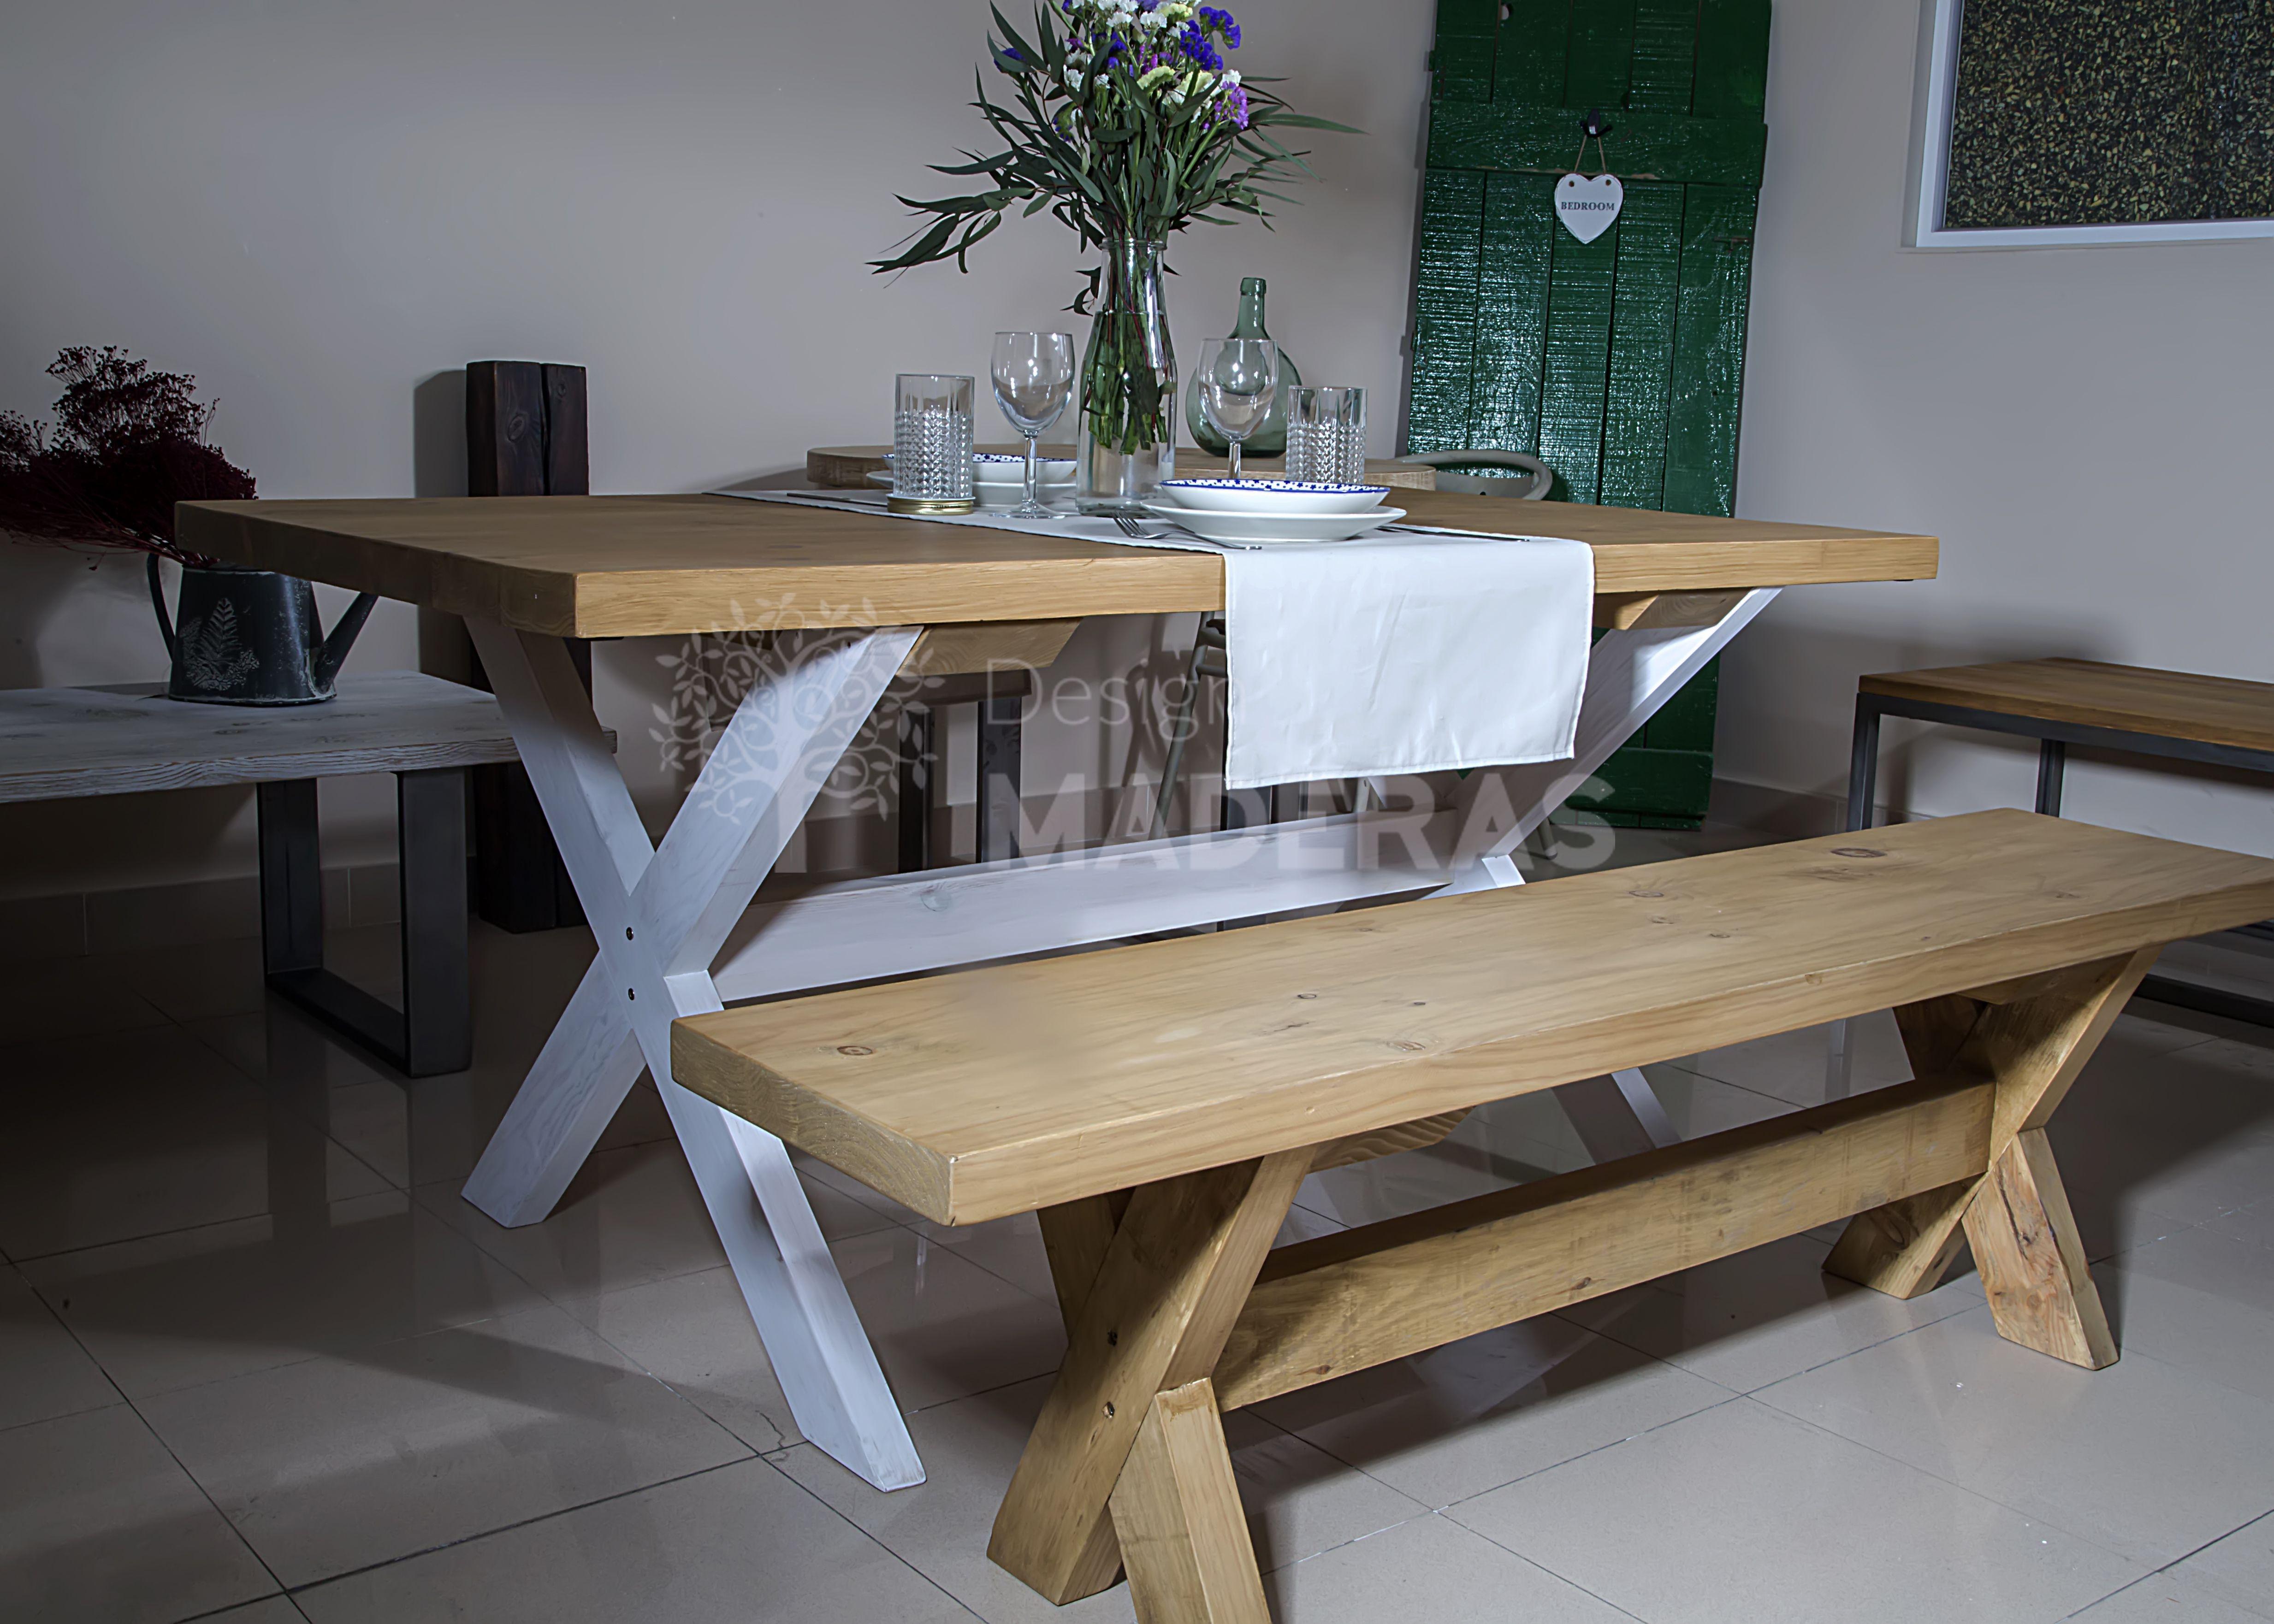 Mesa y banco modelos santorini de madera maciza natural for Banco para mesa de comedor